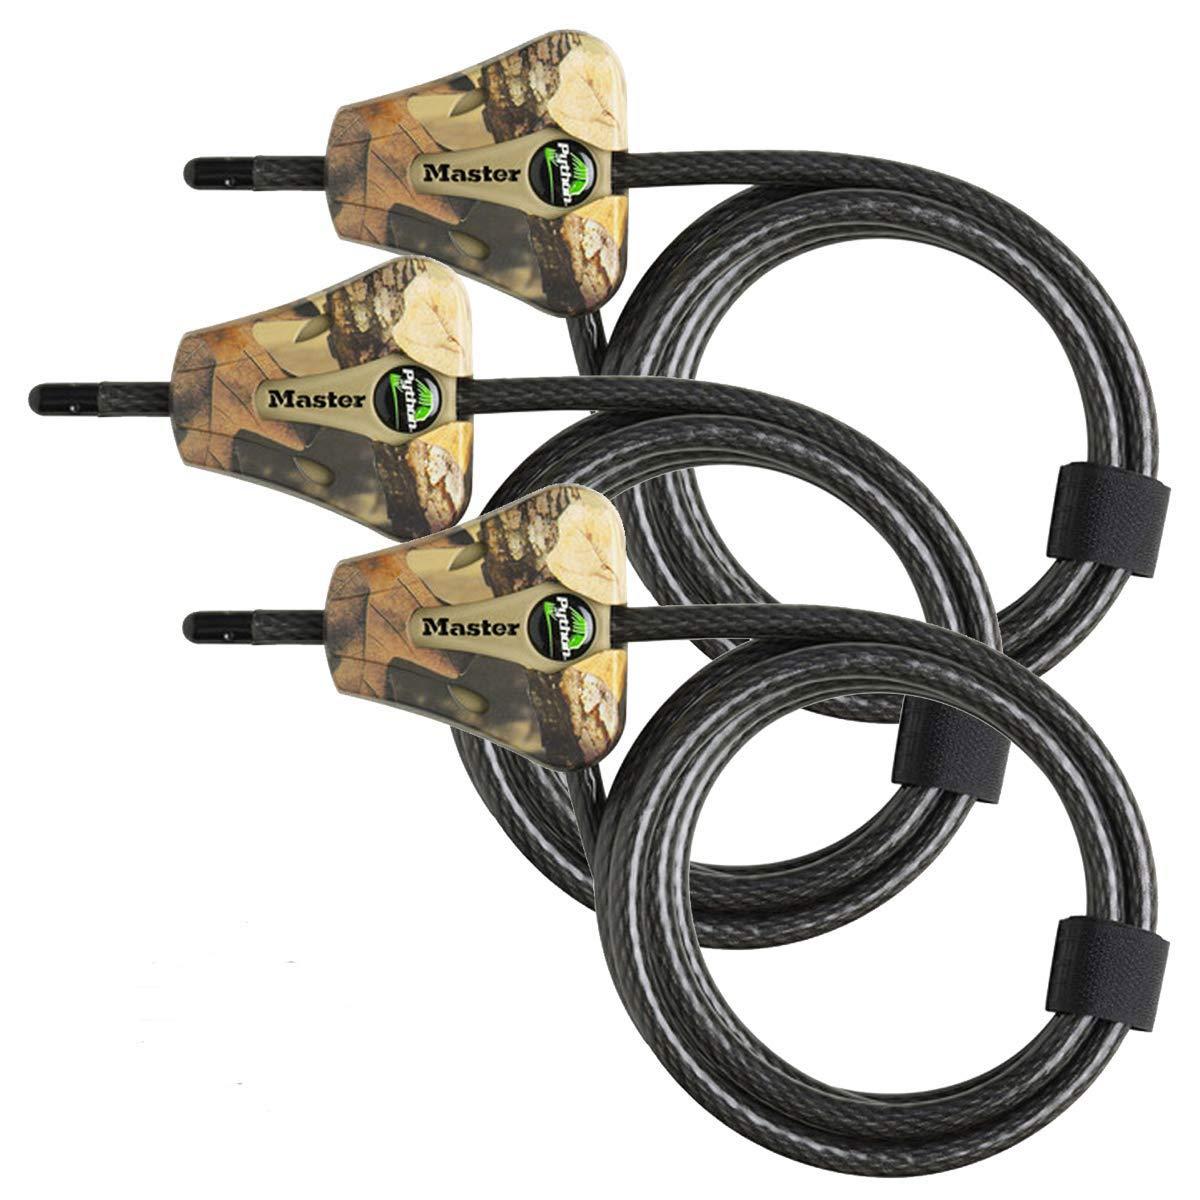 Master Lock – Python Adjustable Camouflage Cable Locks 8418KA CAMO 3-Pack